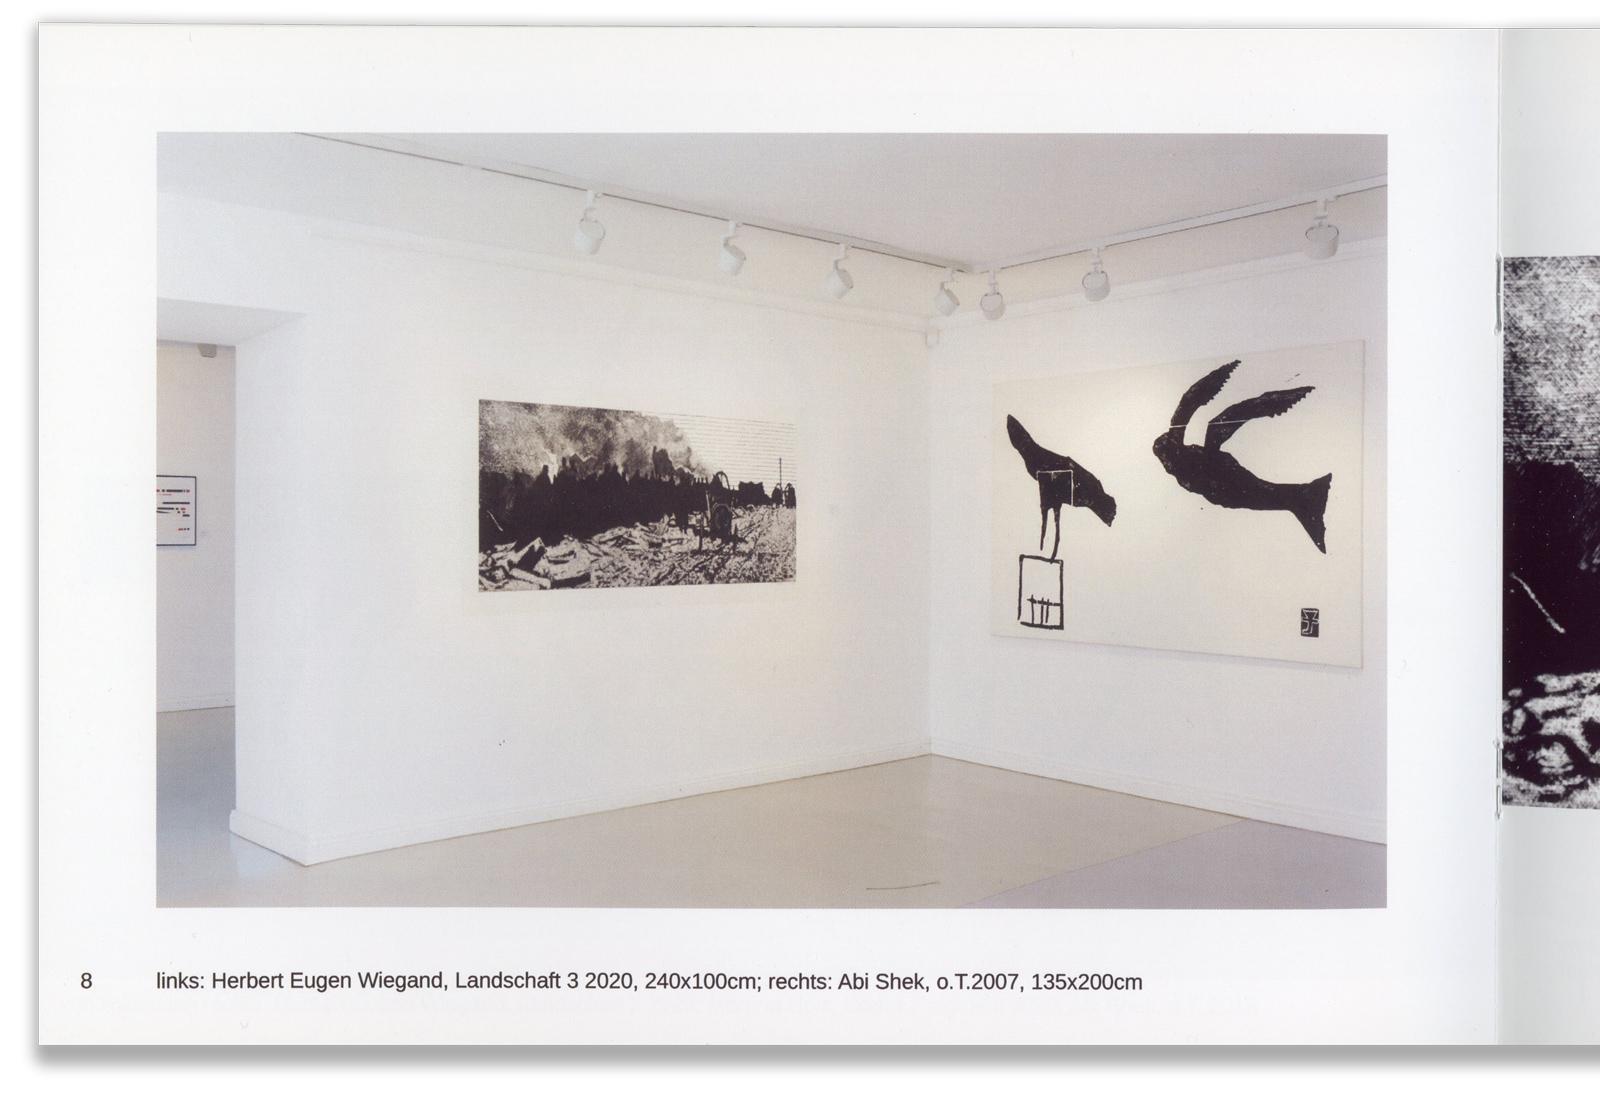 Margret-Holz-Abi-Shek-Herbert-Eugen-Wiegand-Hochdruck-Krautin_Verlag4